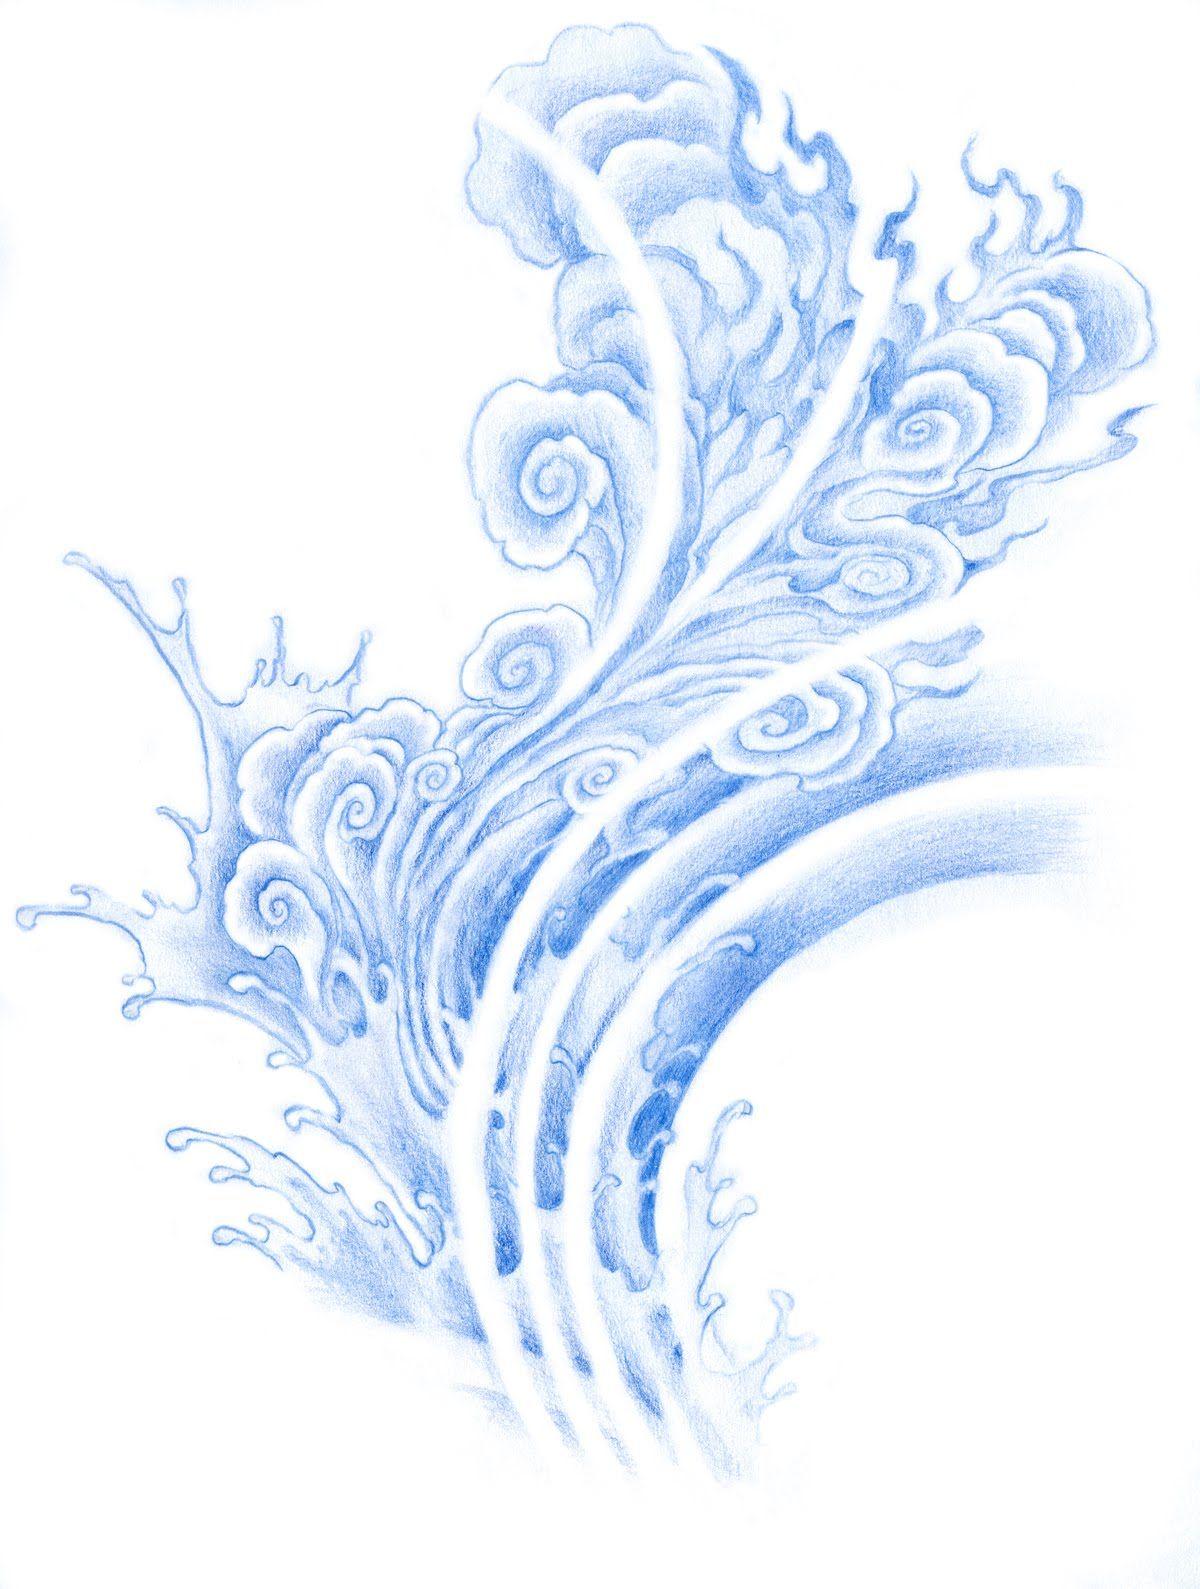 Cloud Tattoo Drawing: Island Of Heaven Art Piece